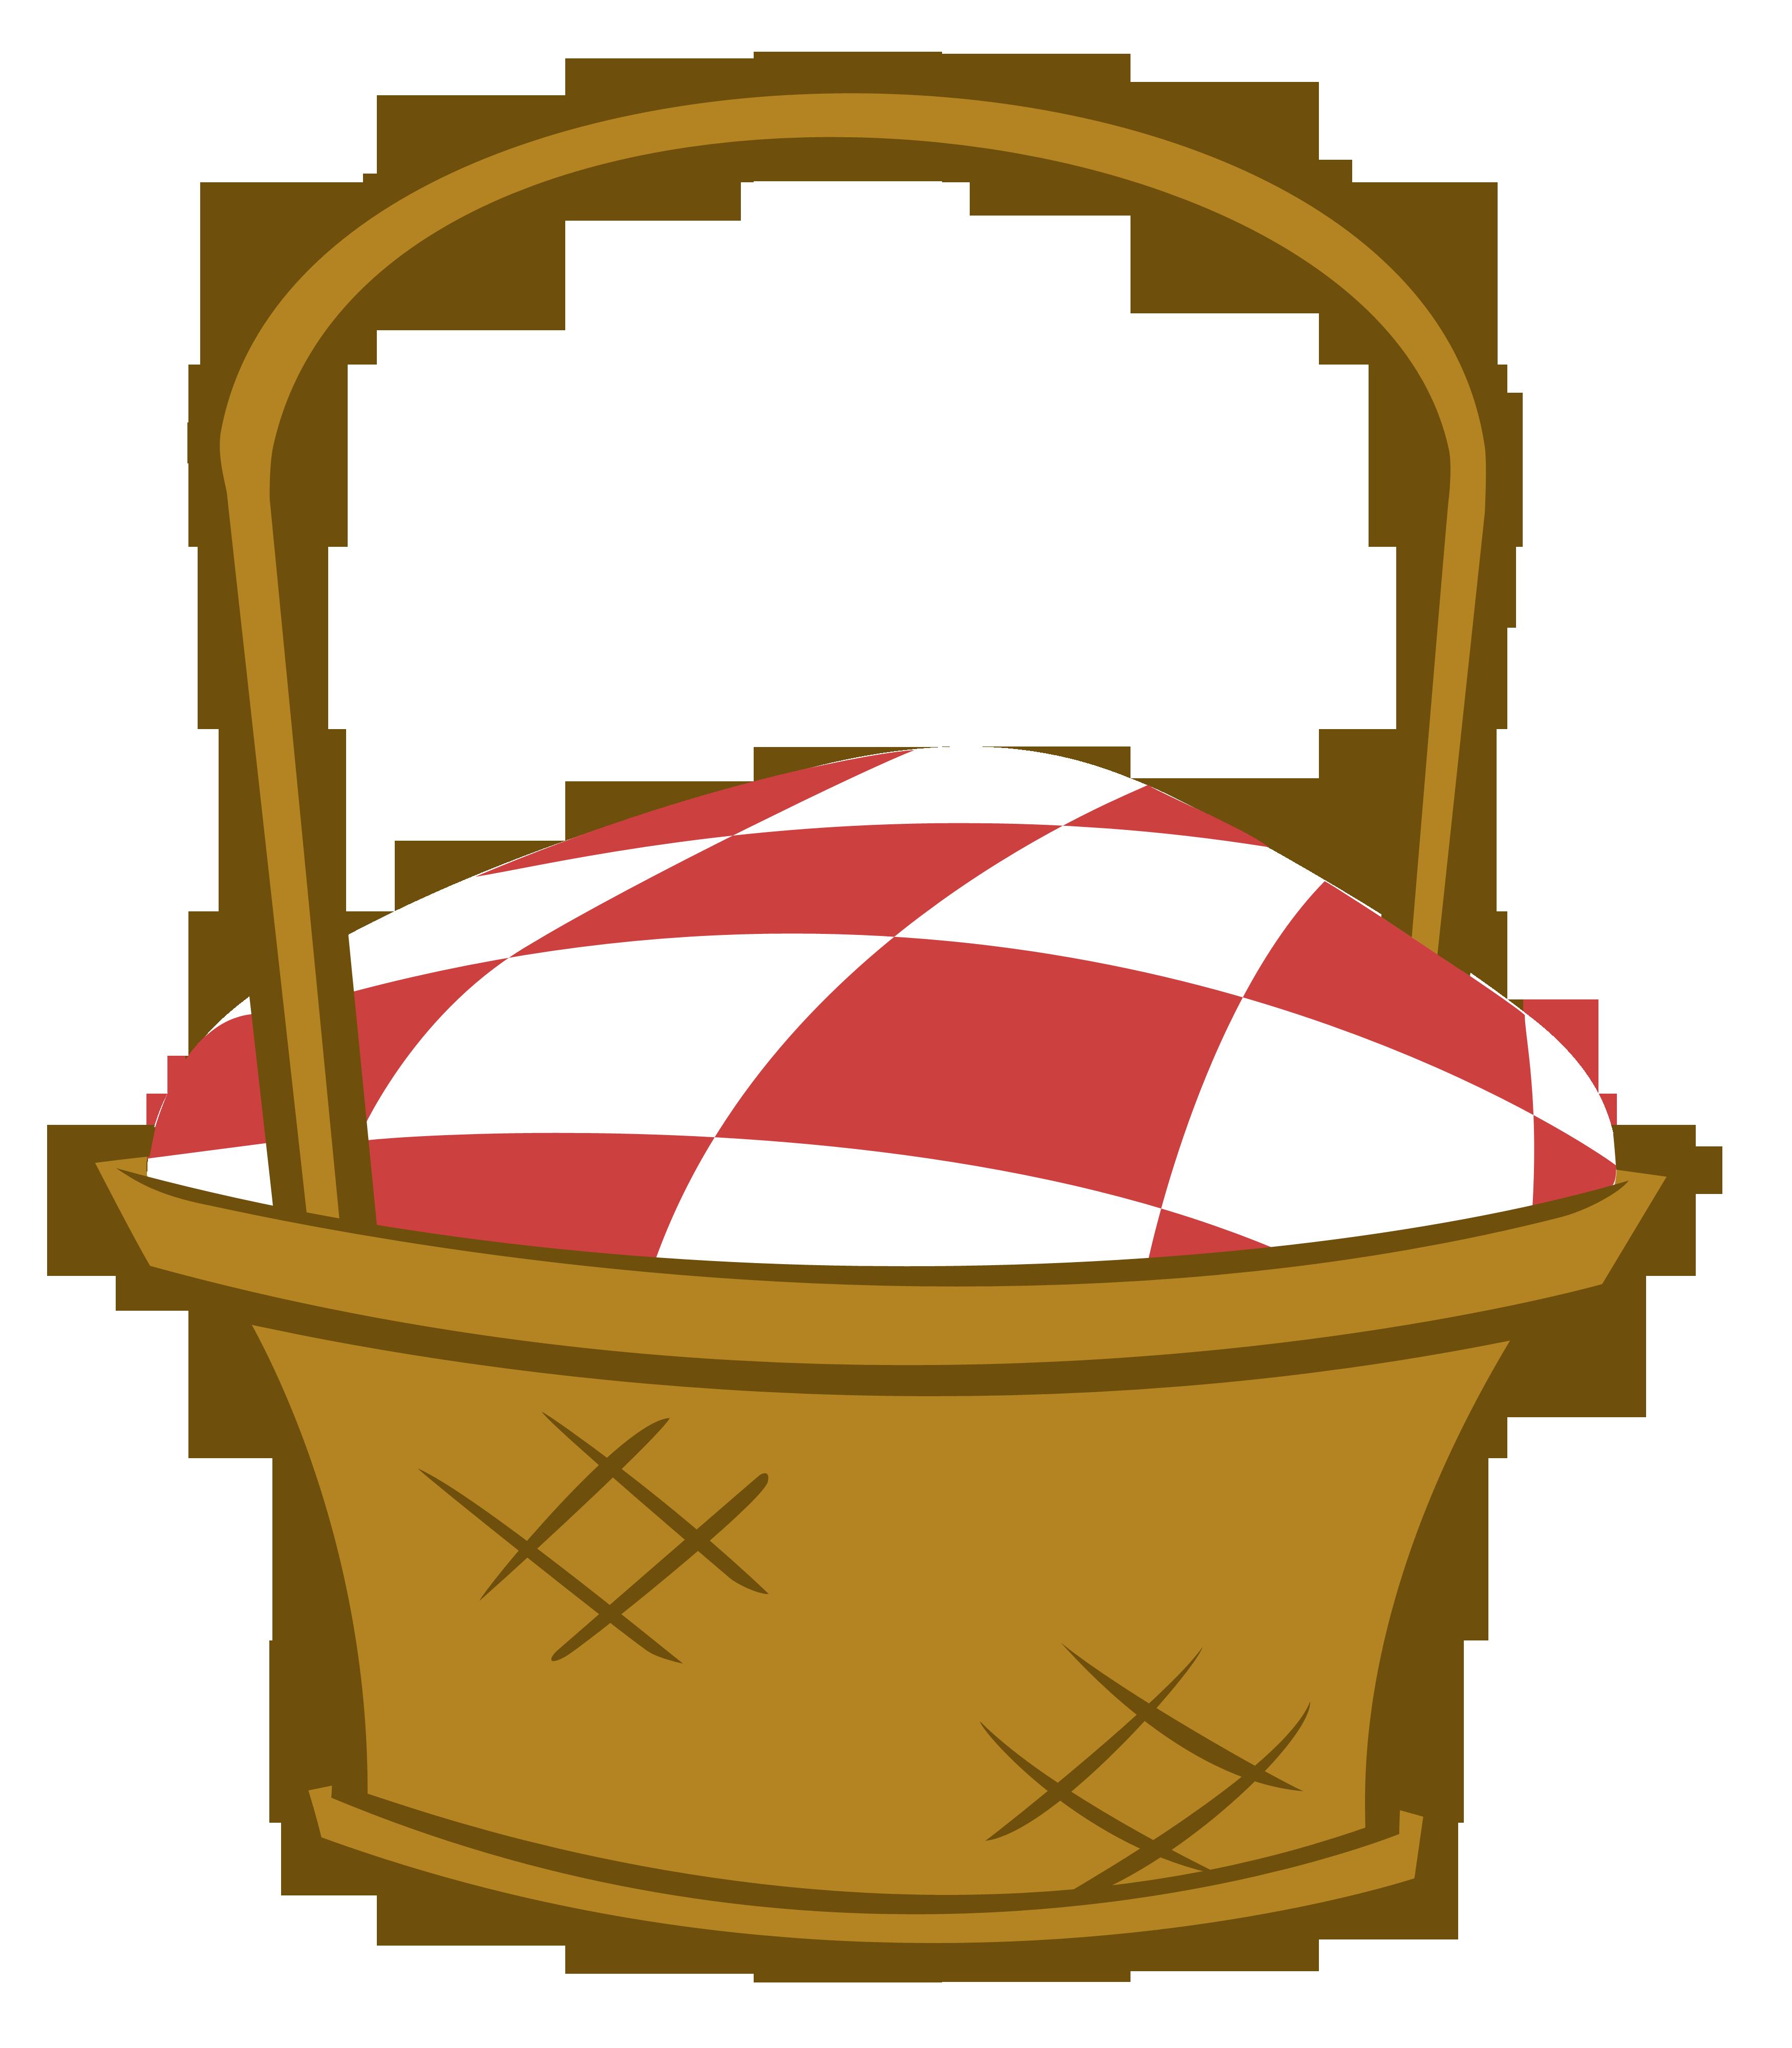 Picnic Basket clipart picnic mat Picnic Art Panda Free Basket